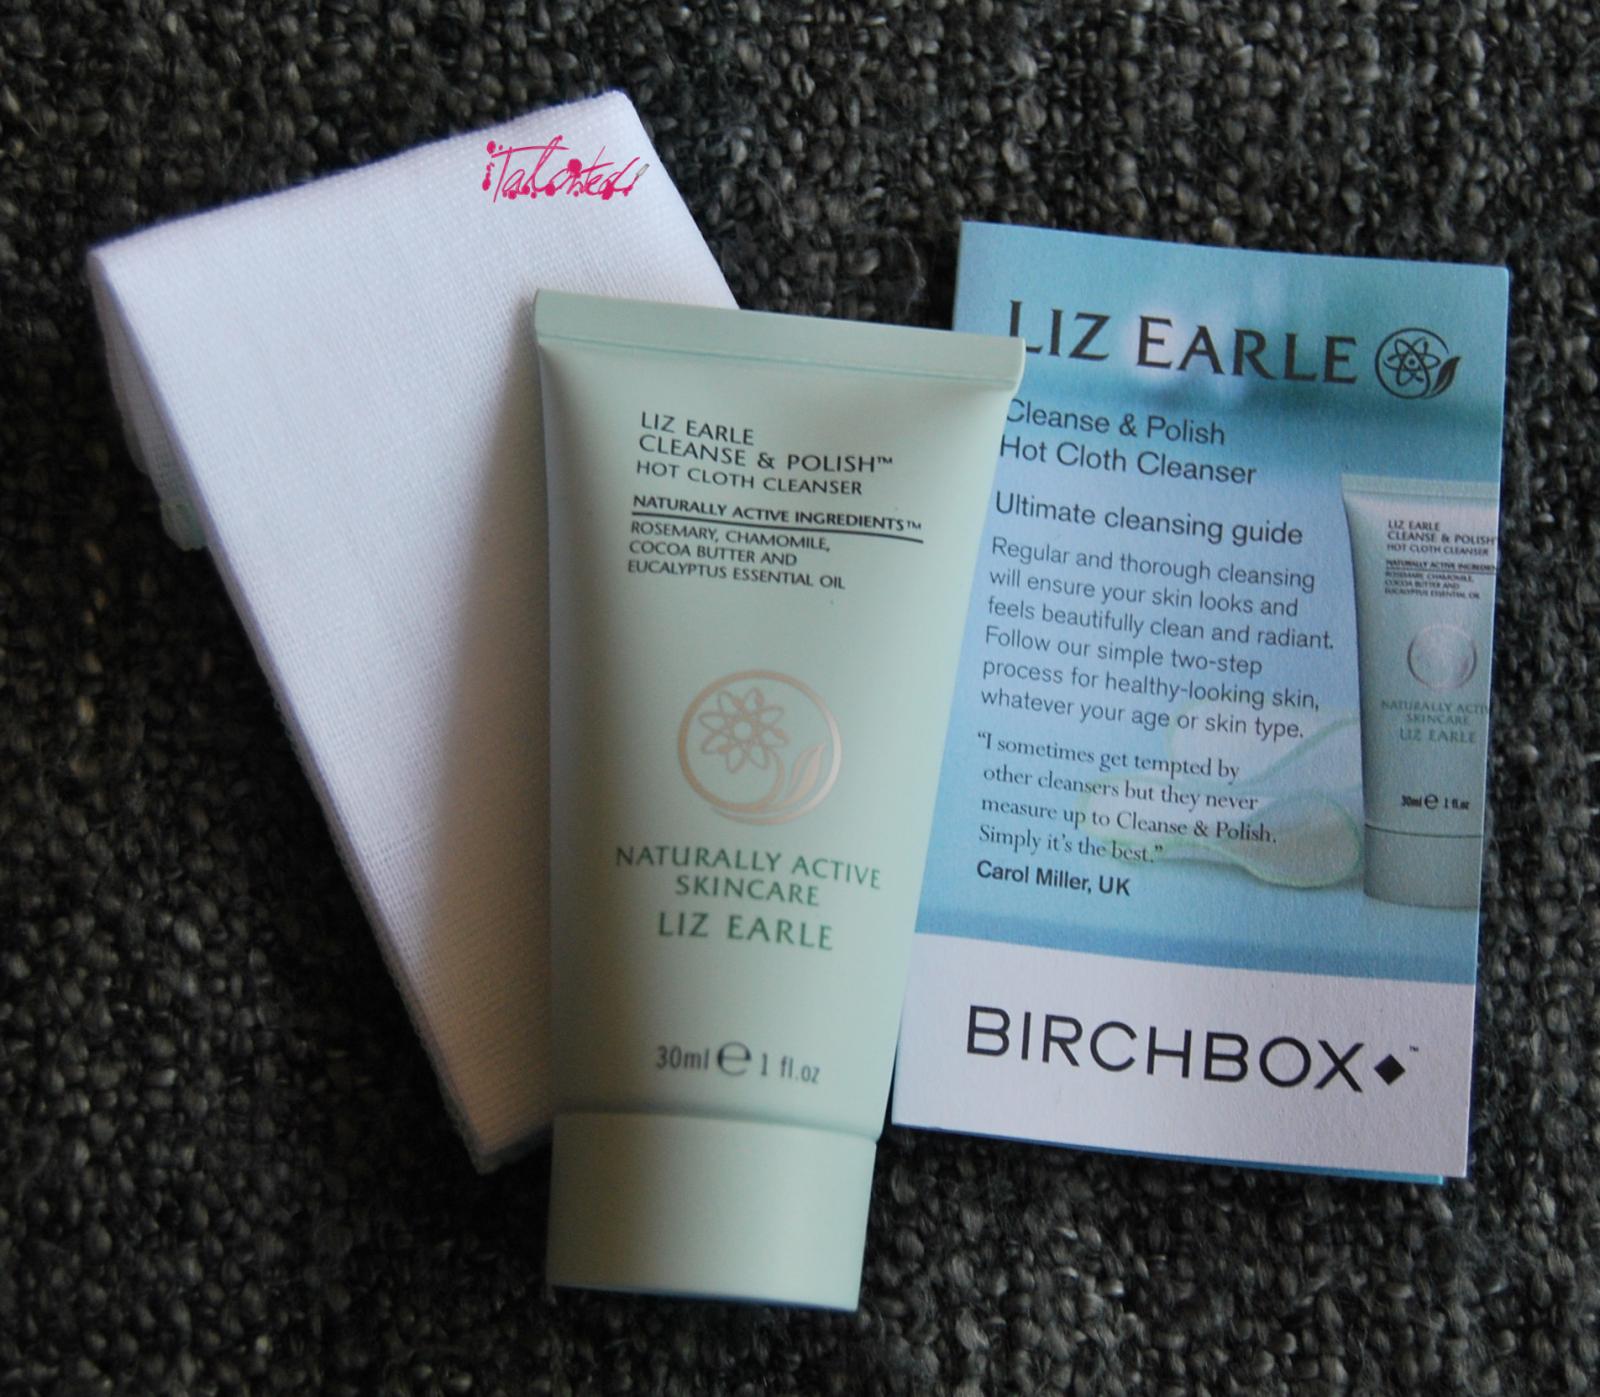 Birchbox May Box With Harper's Bazaar